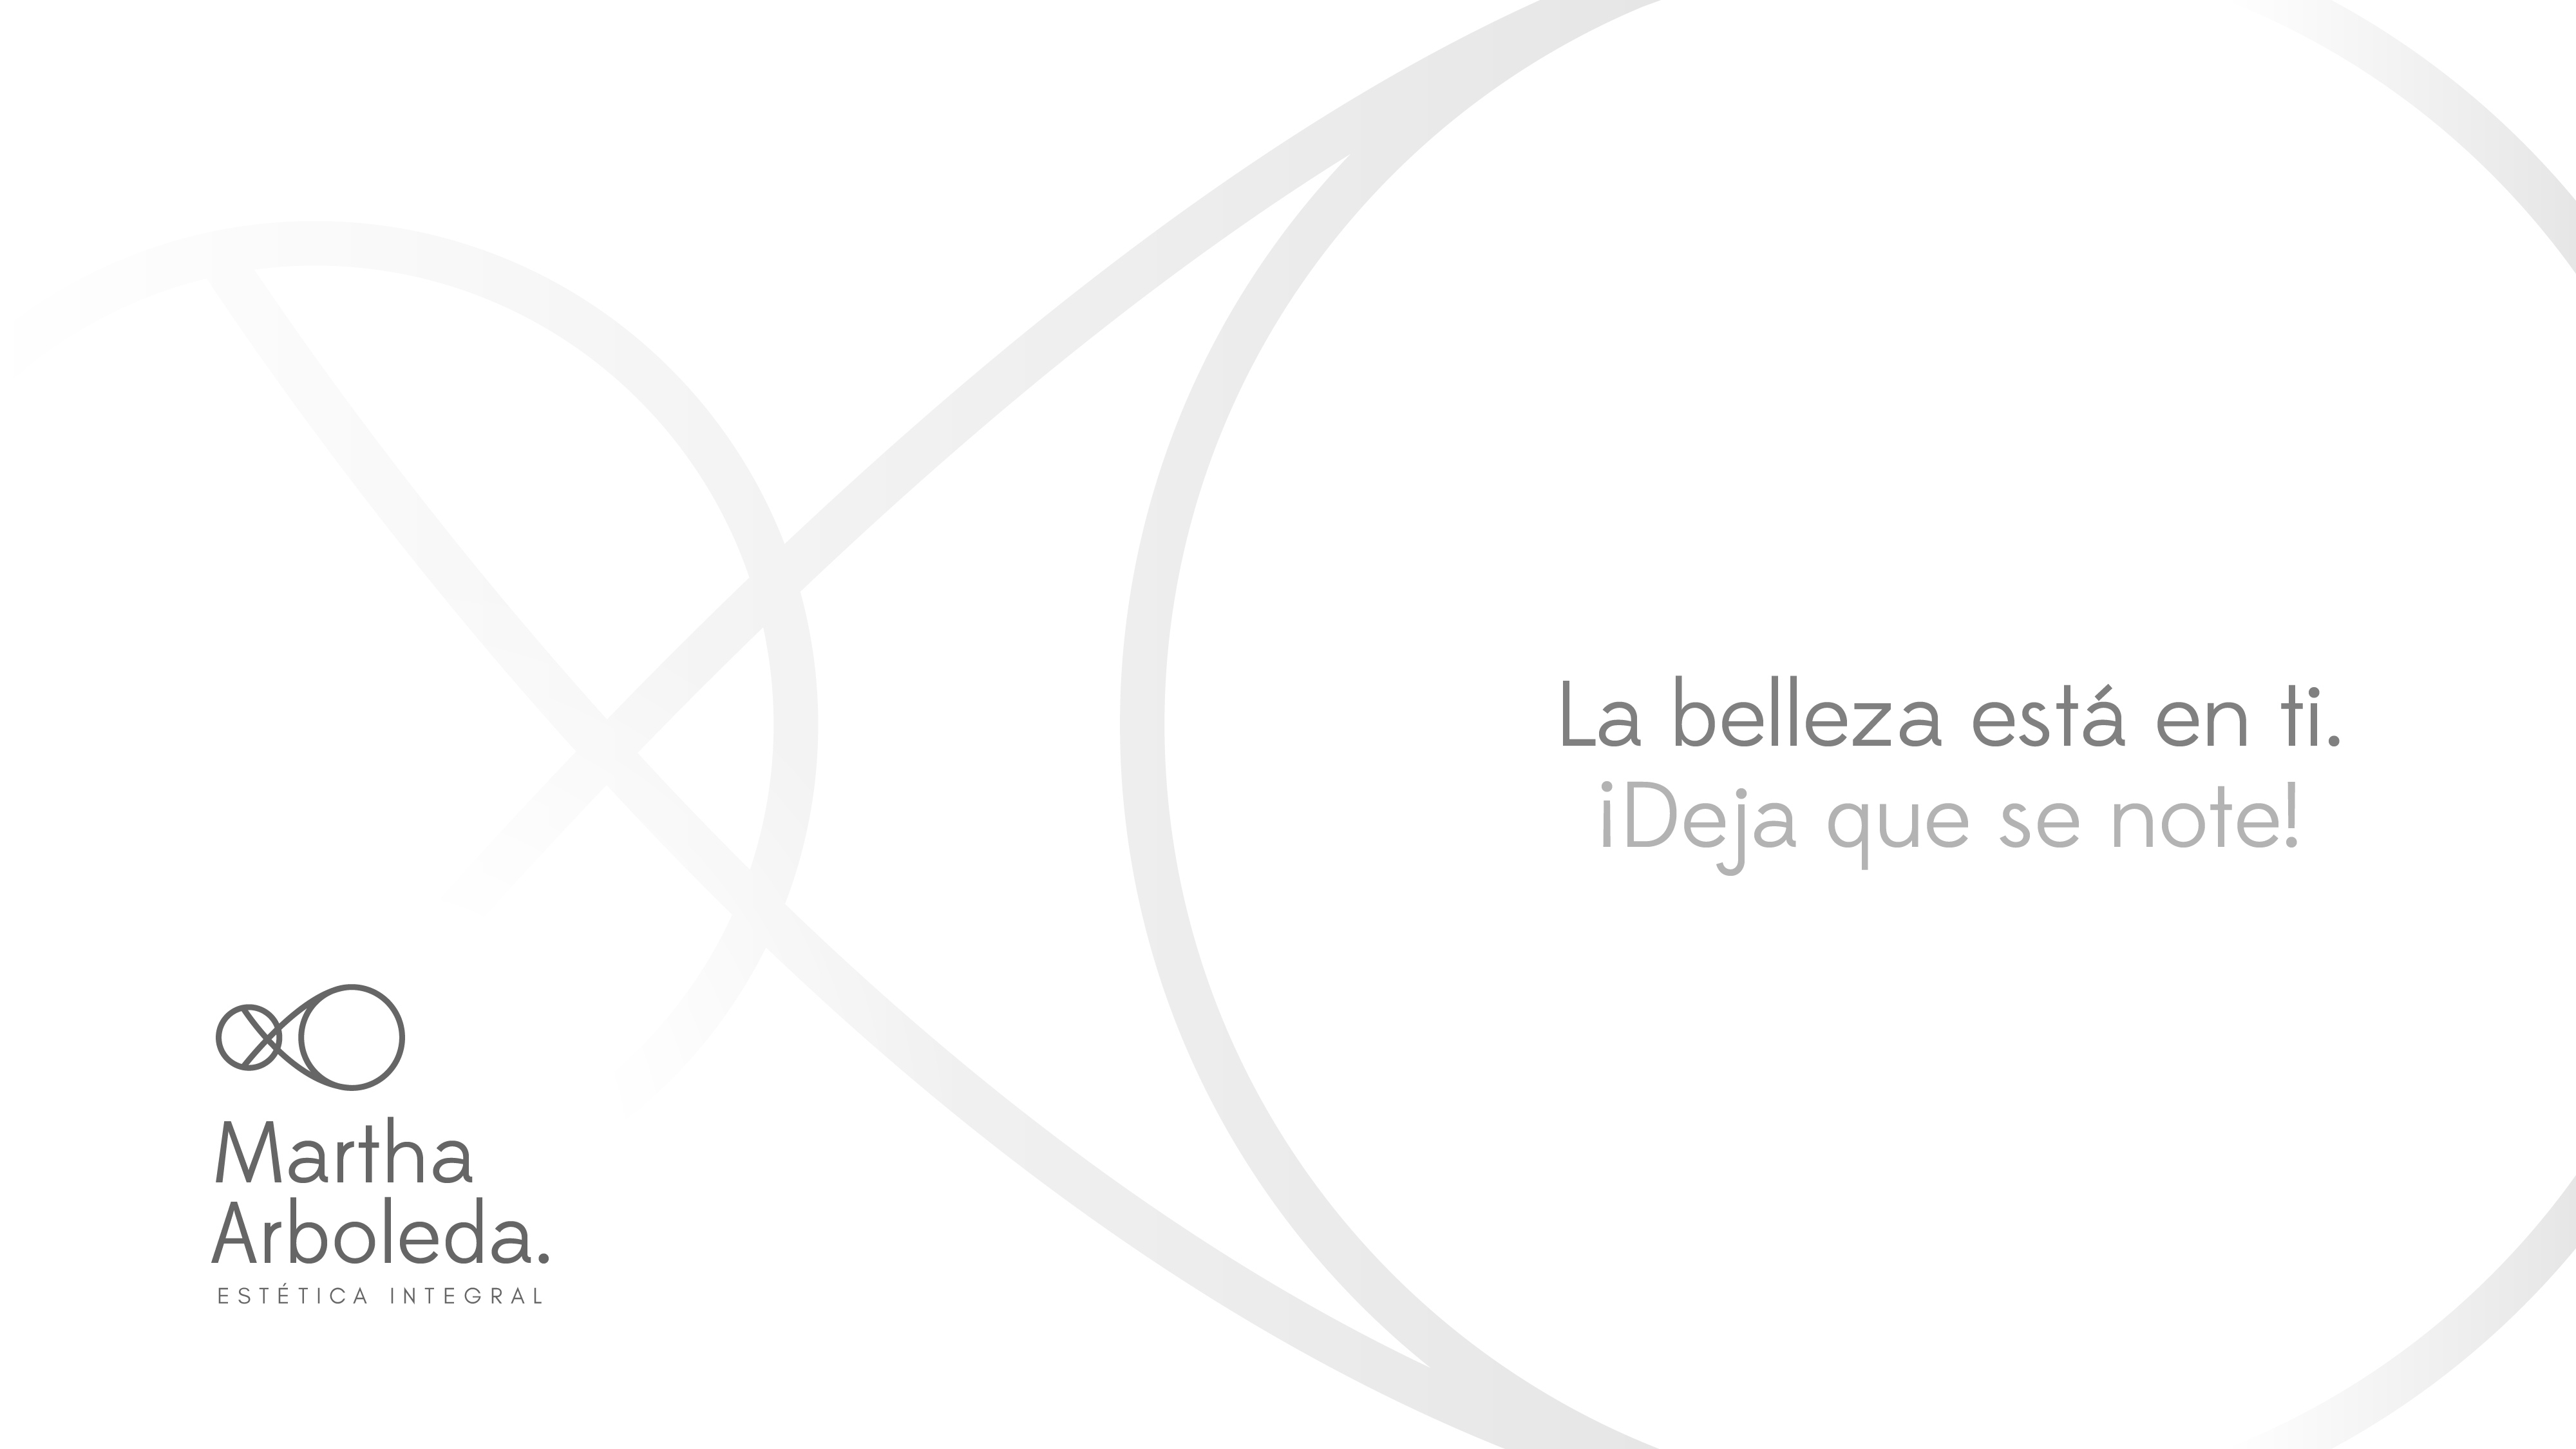 17_09_13_Identidad_Martha_Arboleda-14